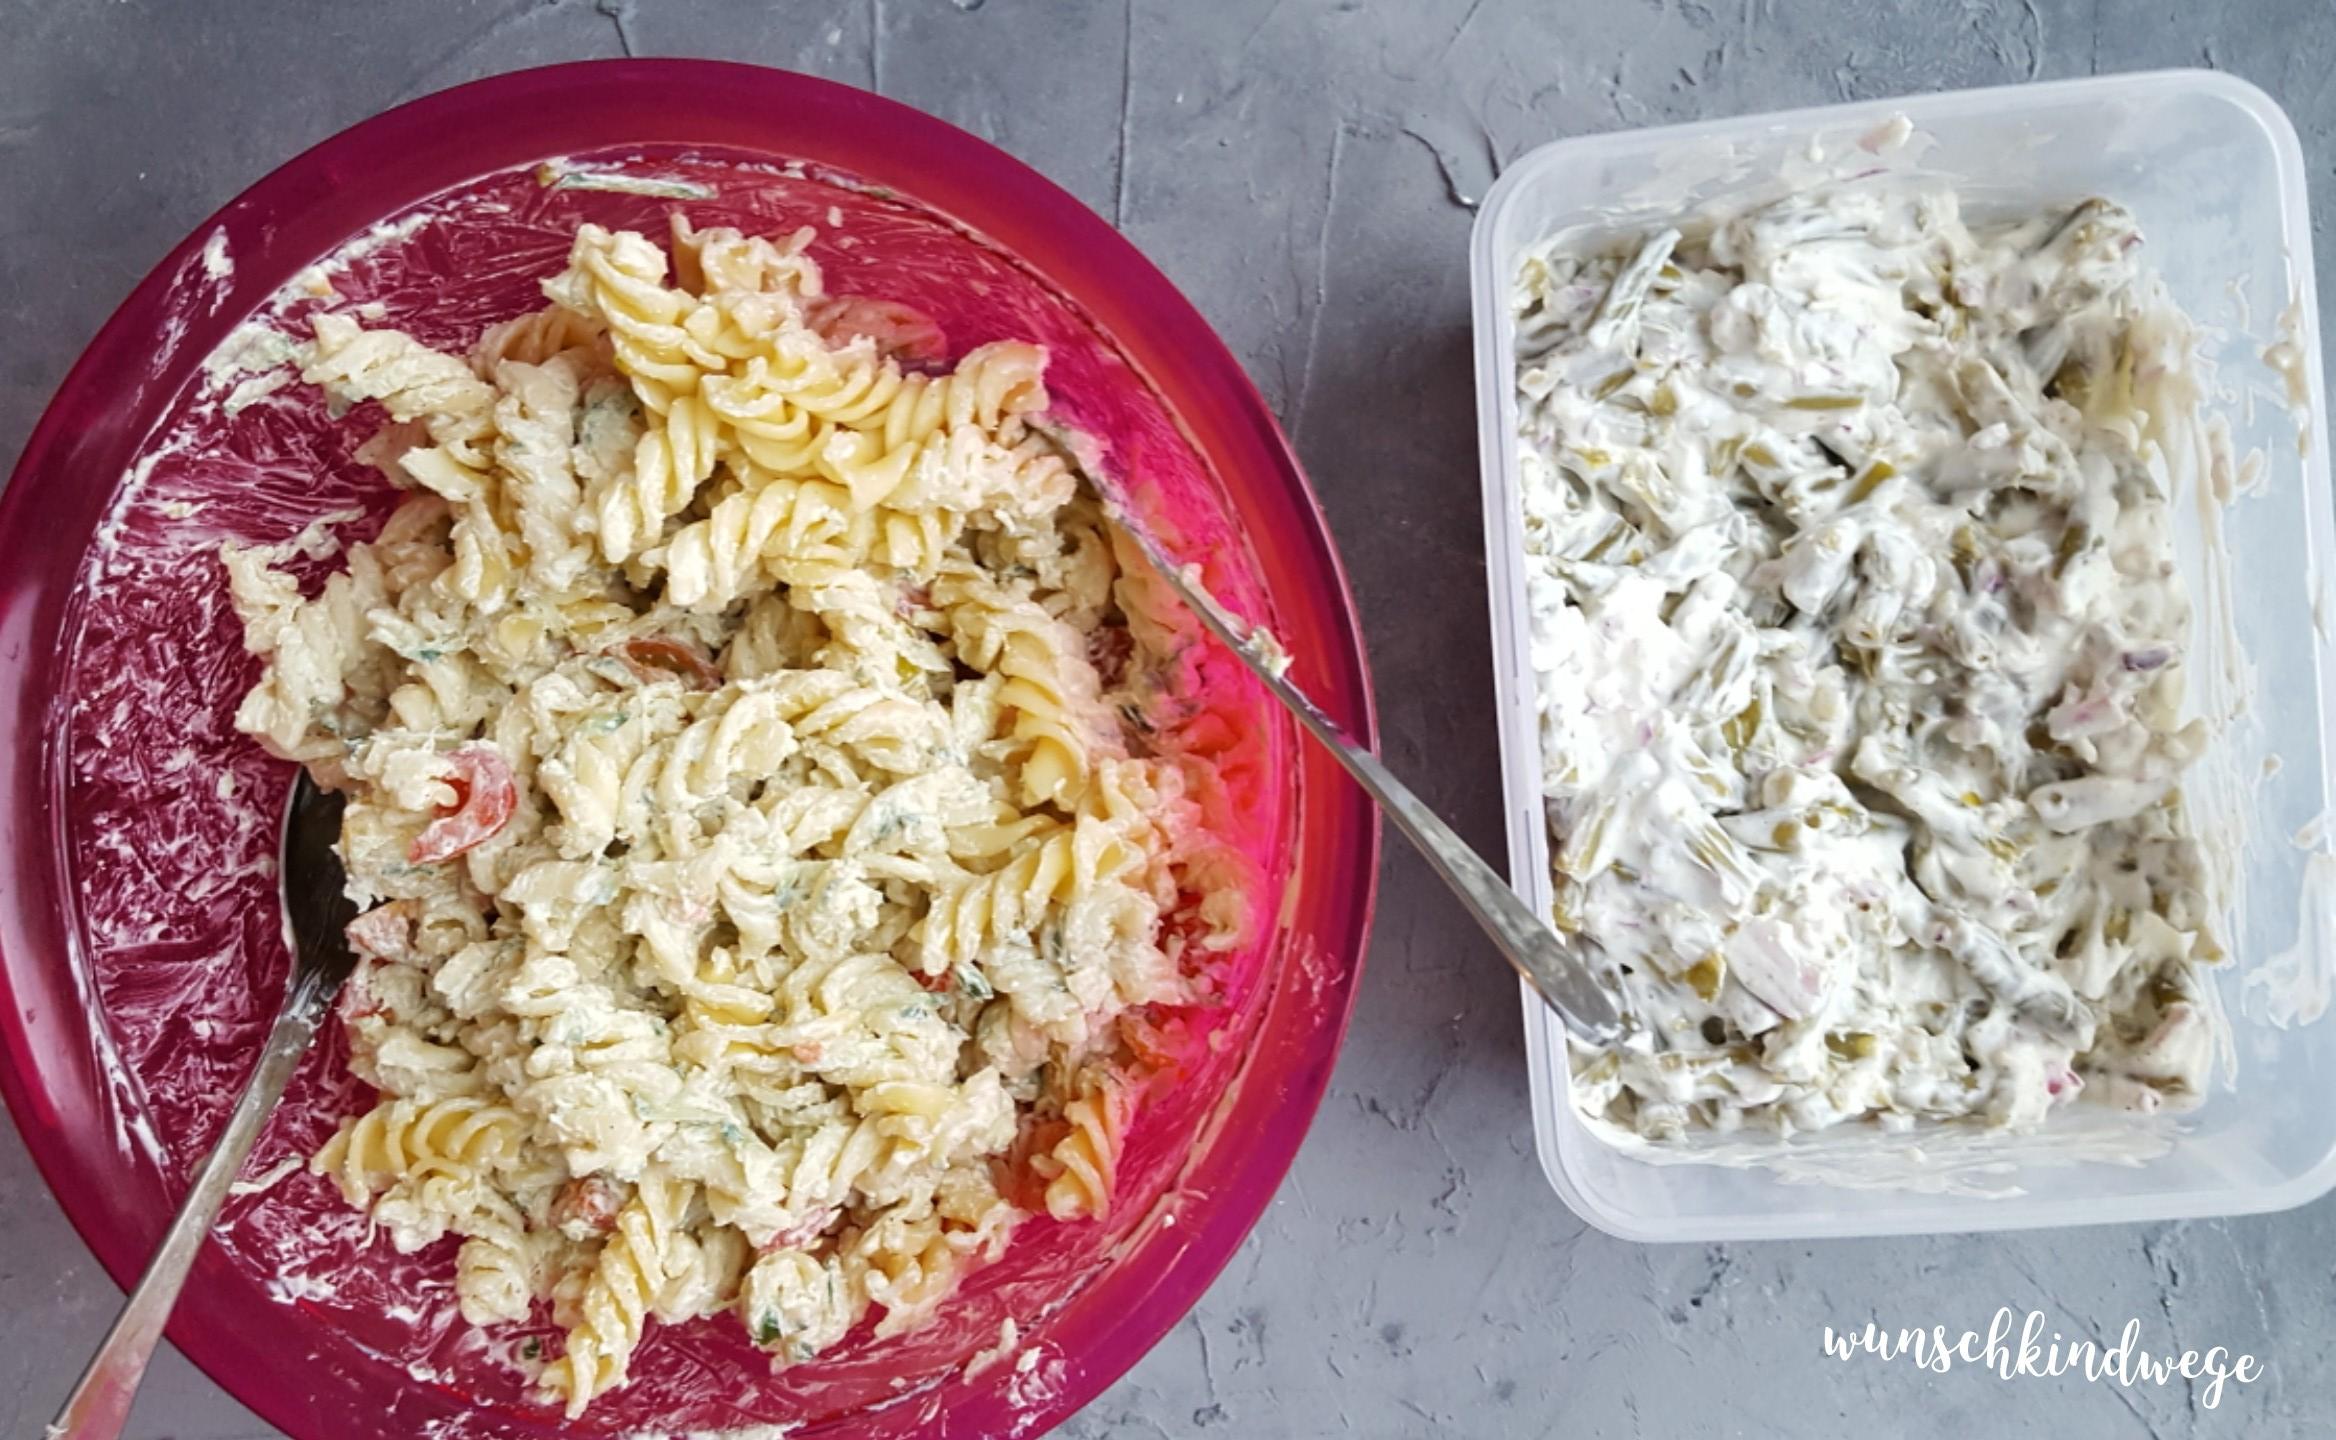 Osterwochenende in Bildern: Salate